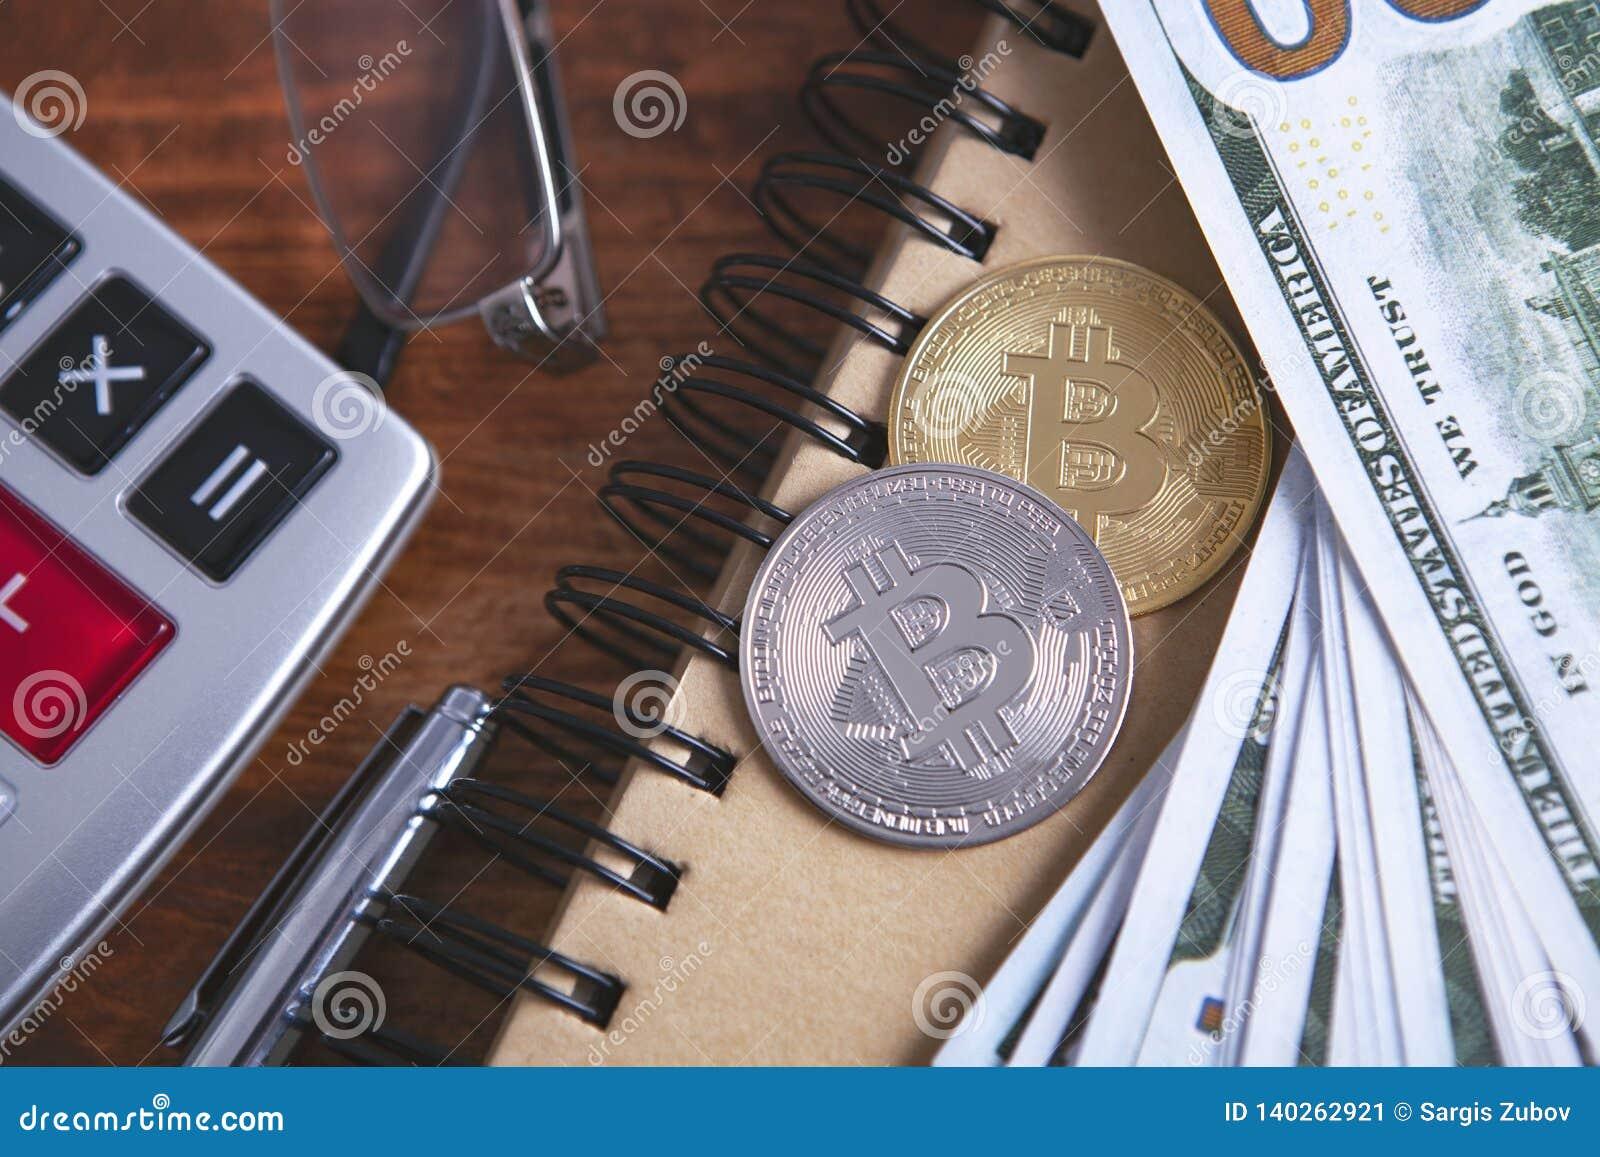 Calculator dollars bitcoin stock image. Image of balance - 140262921